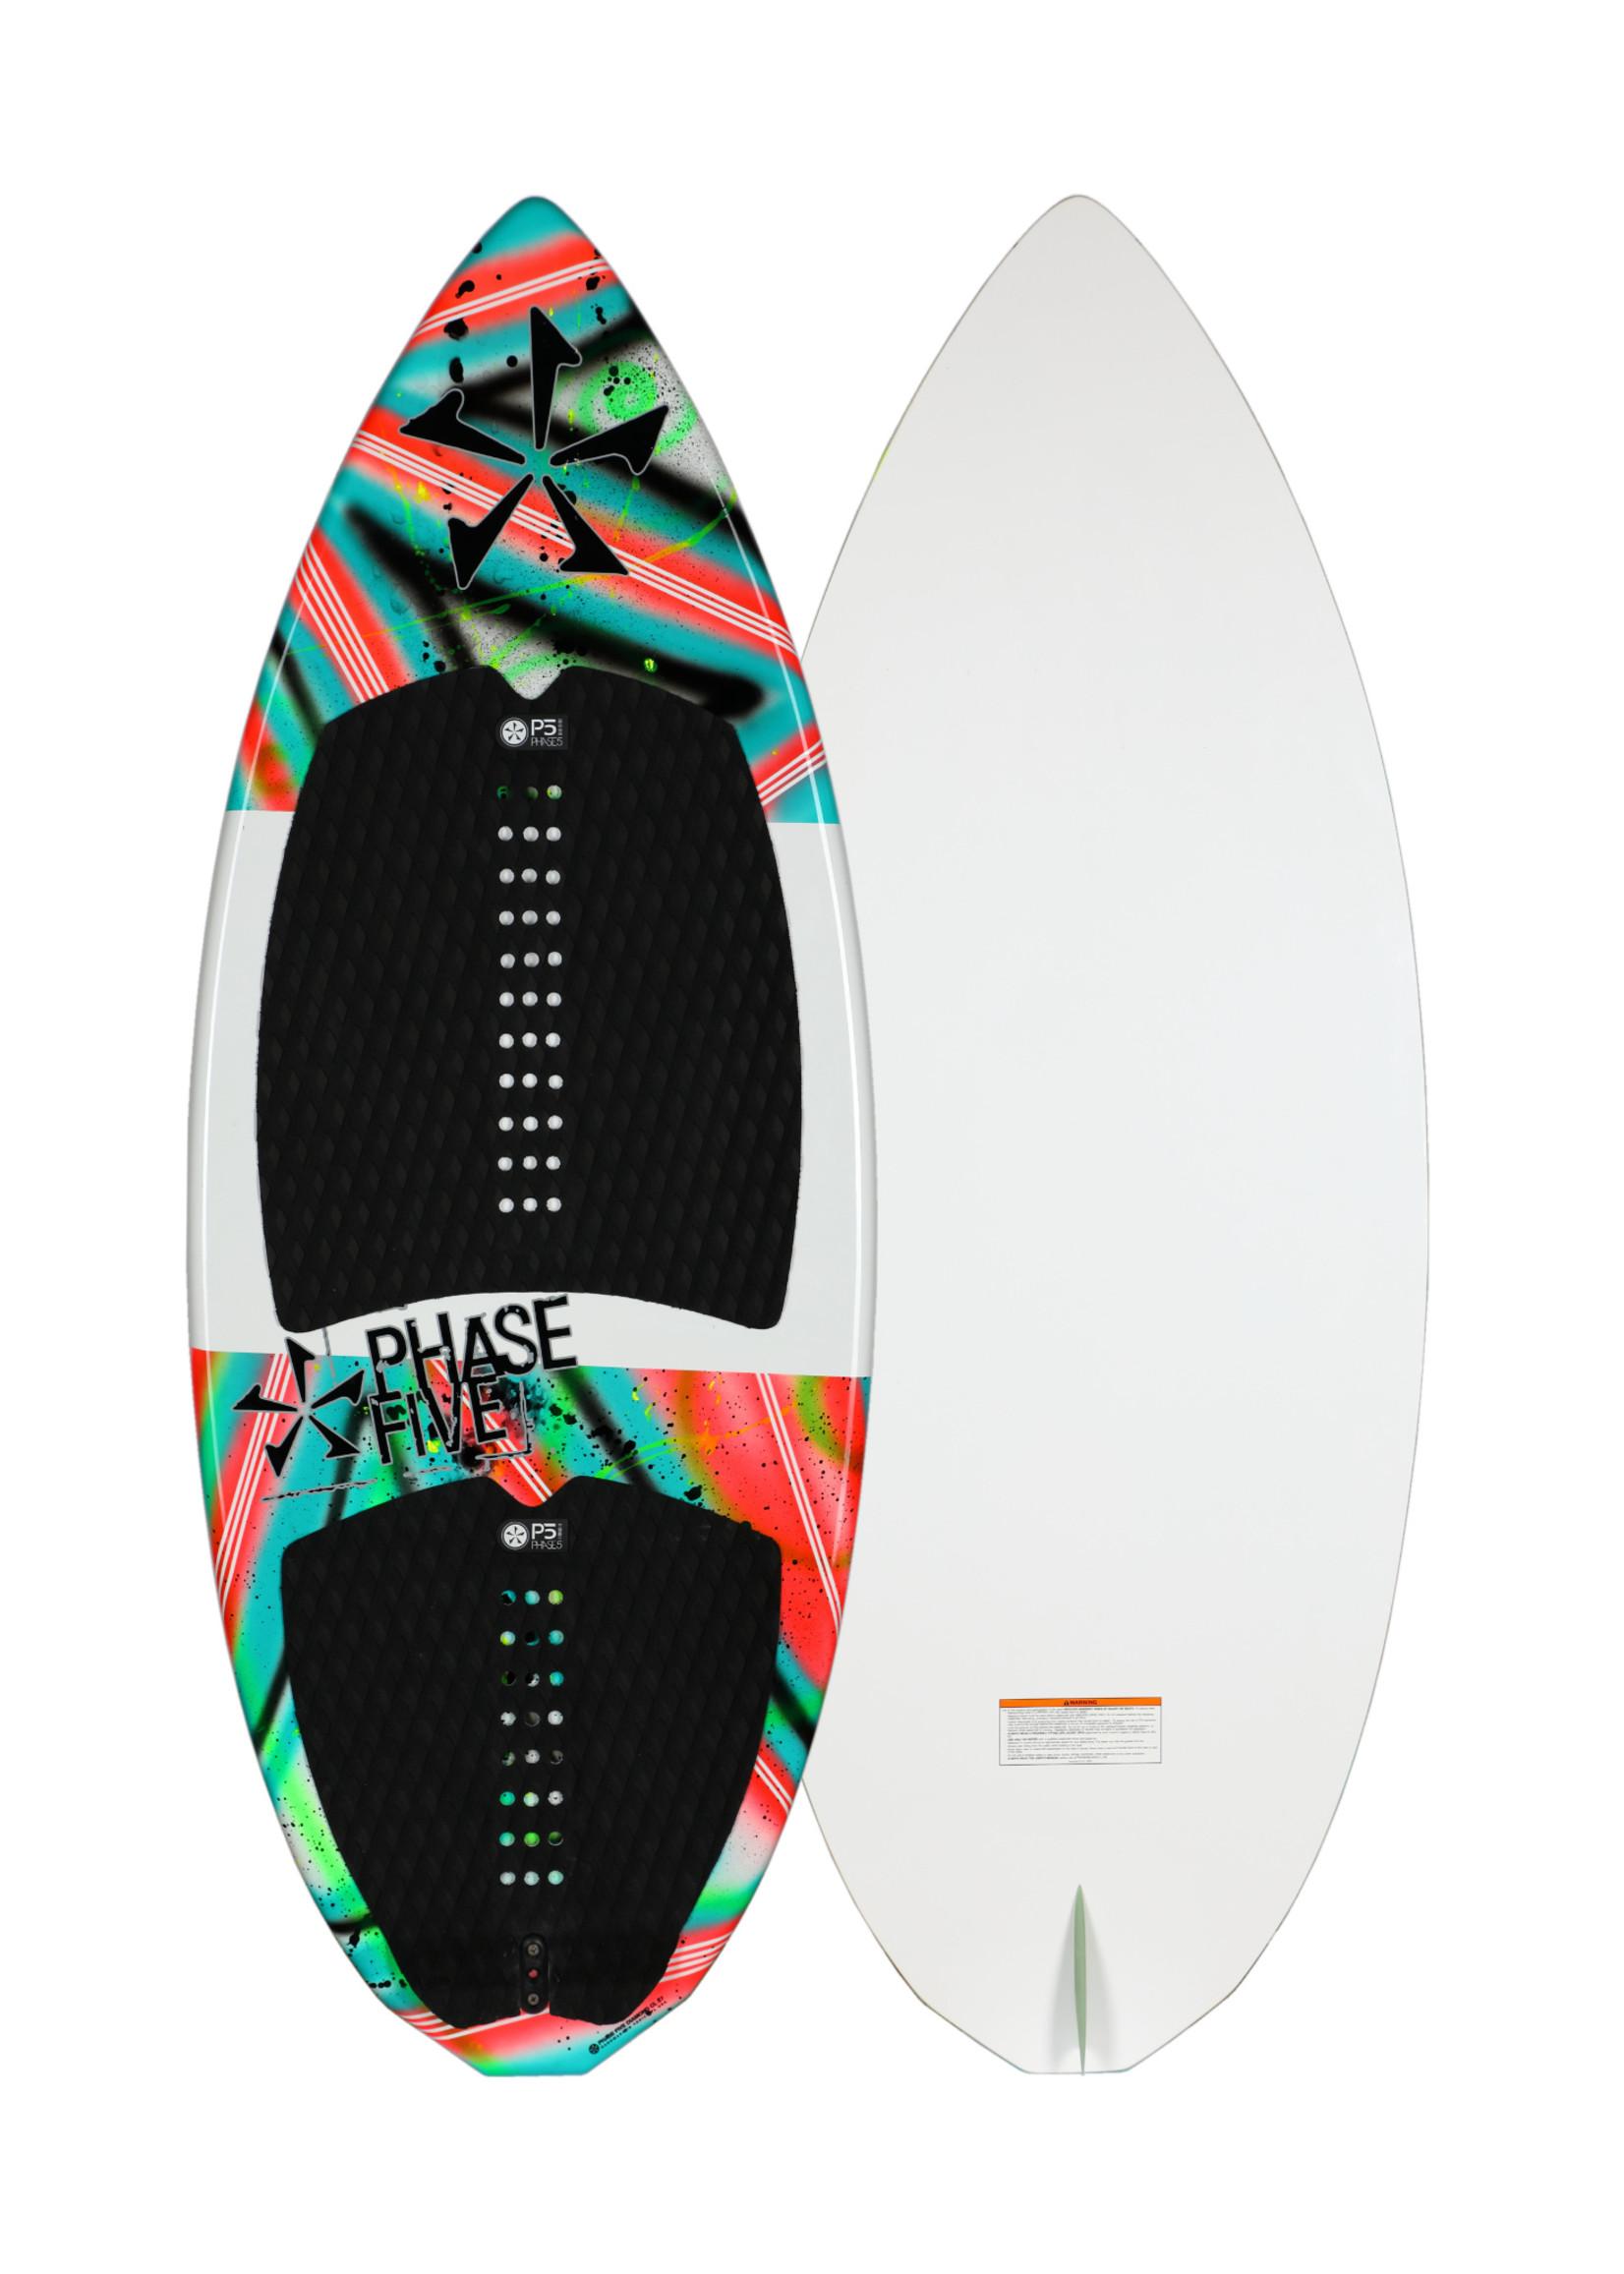 "Phase Five Phase Five Diamond CL 57"" Skim-Style Wakesurf"